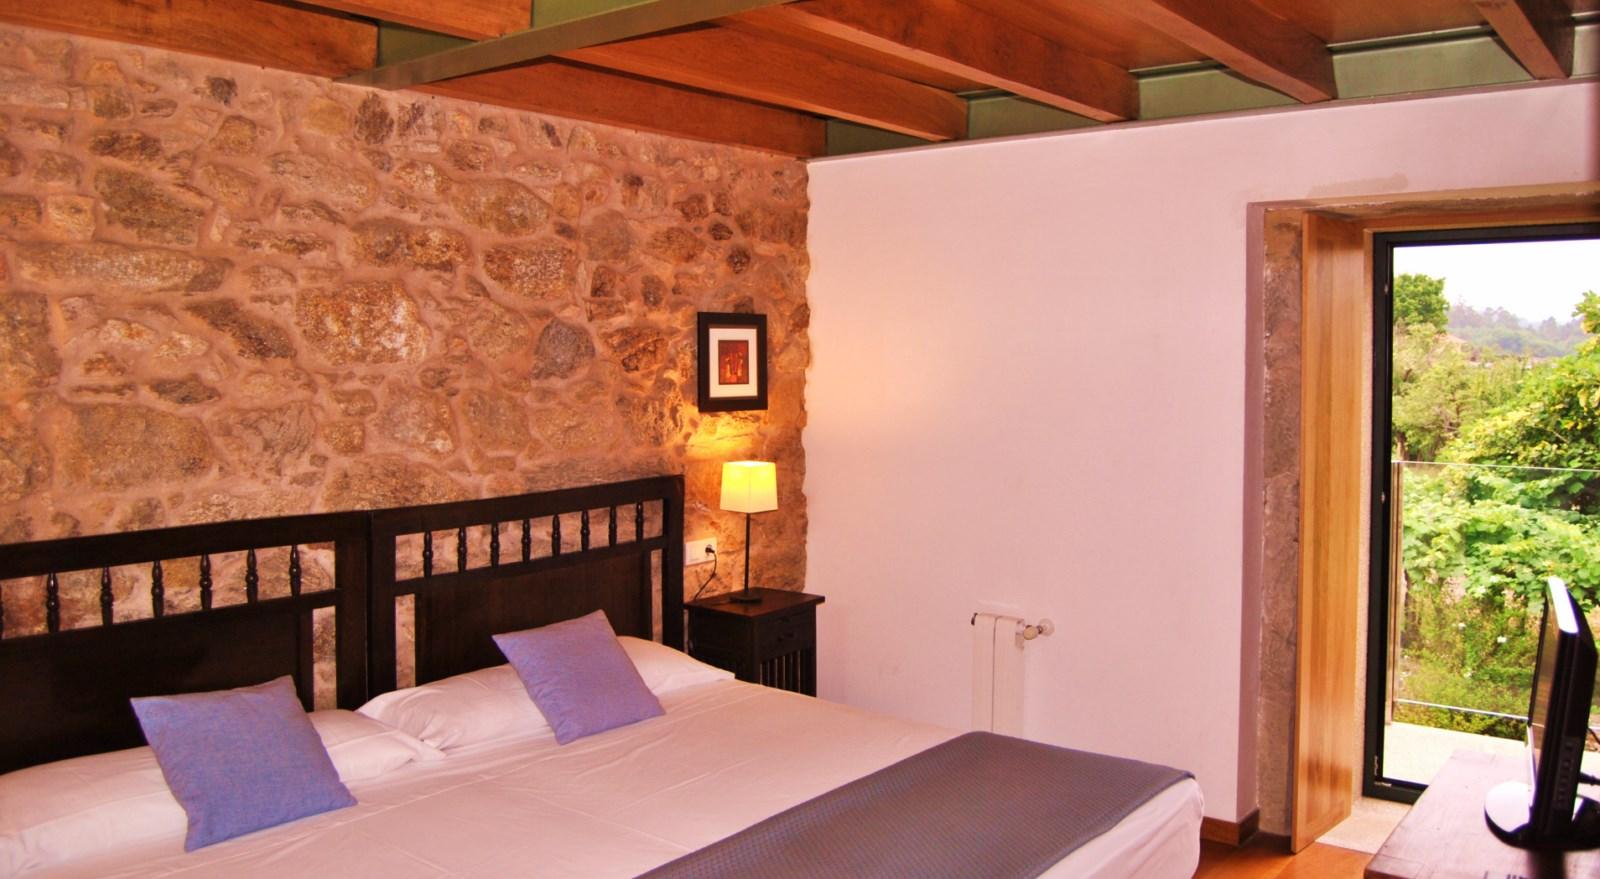 cuarto Torres d Moreda [1600x1200]